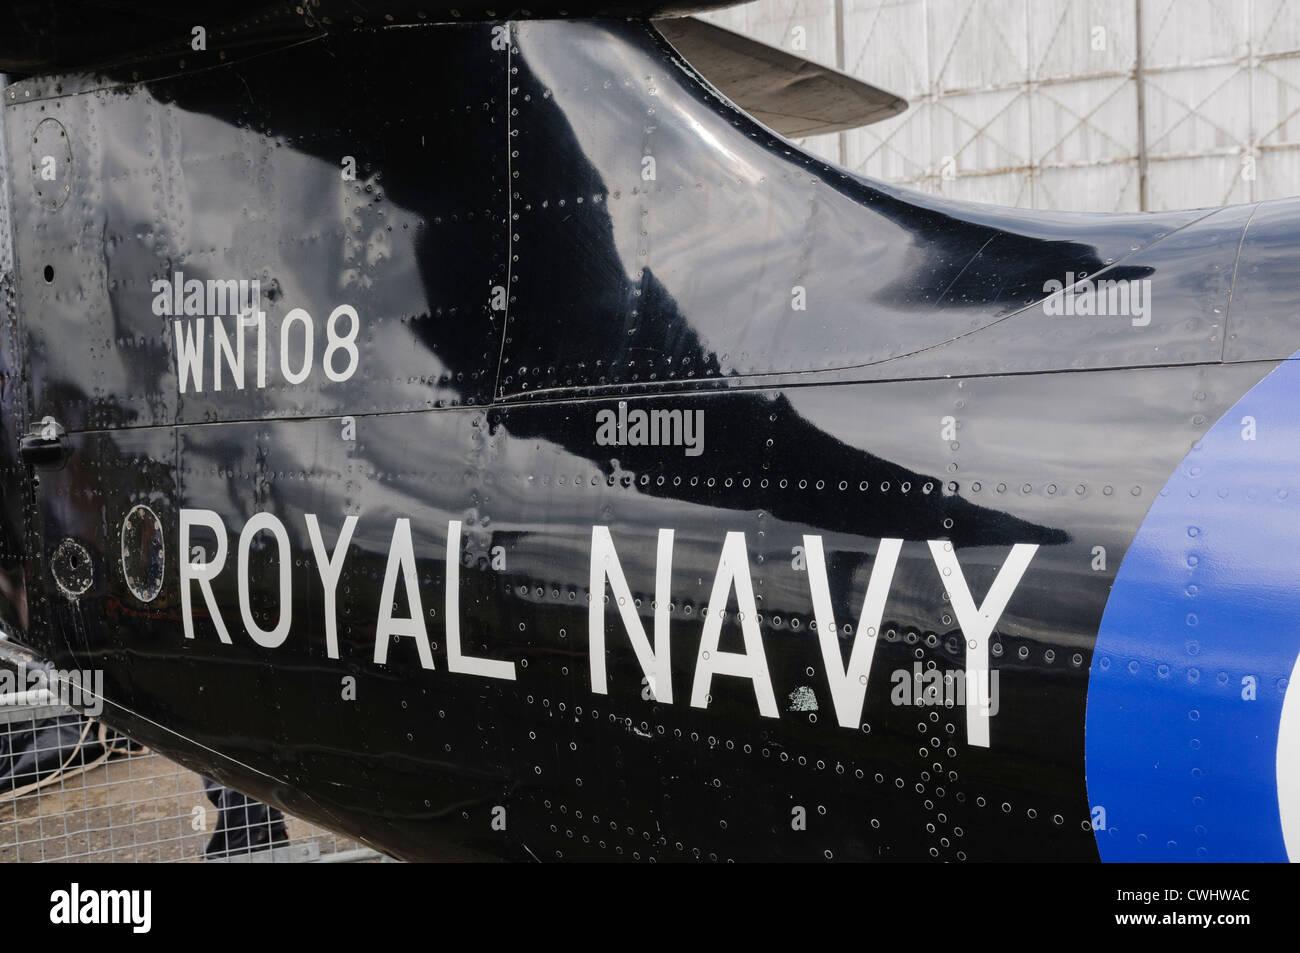 Royal Navy logo on the tail of a 1954 Hawker Sea Hawk aircraft - Stock Image